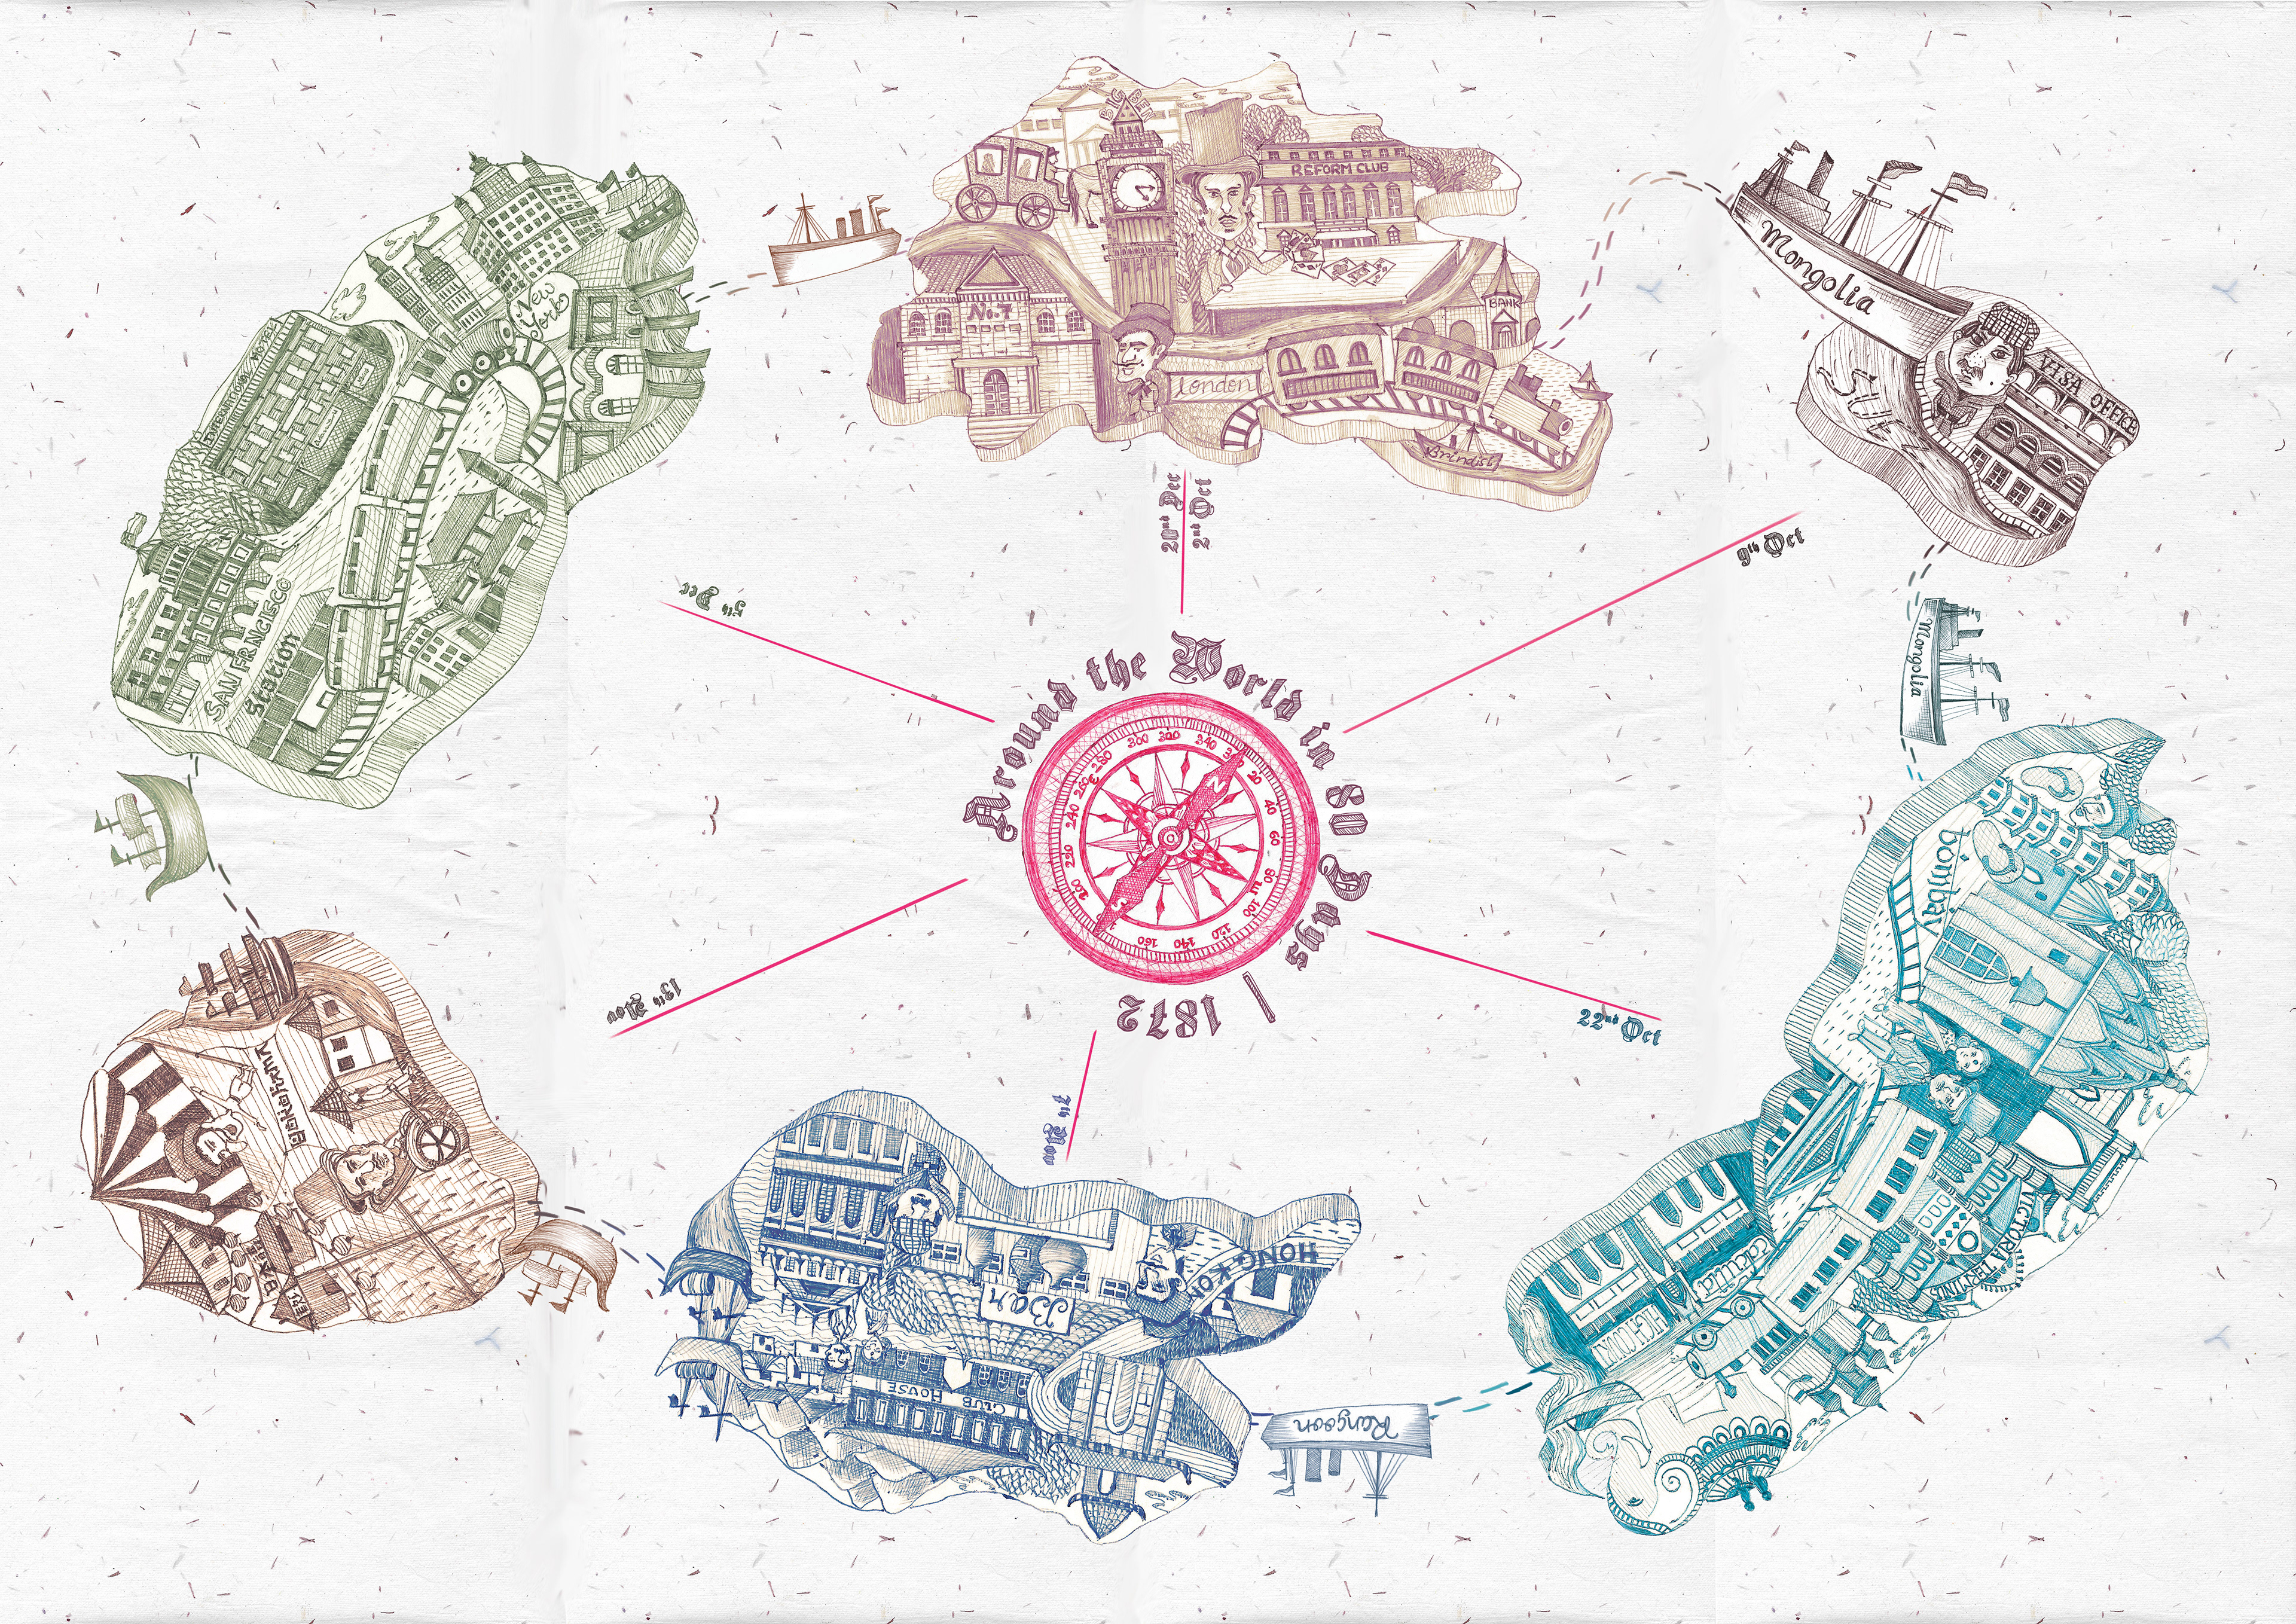 Roopal Jain - Map: Around the World in 80 Days